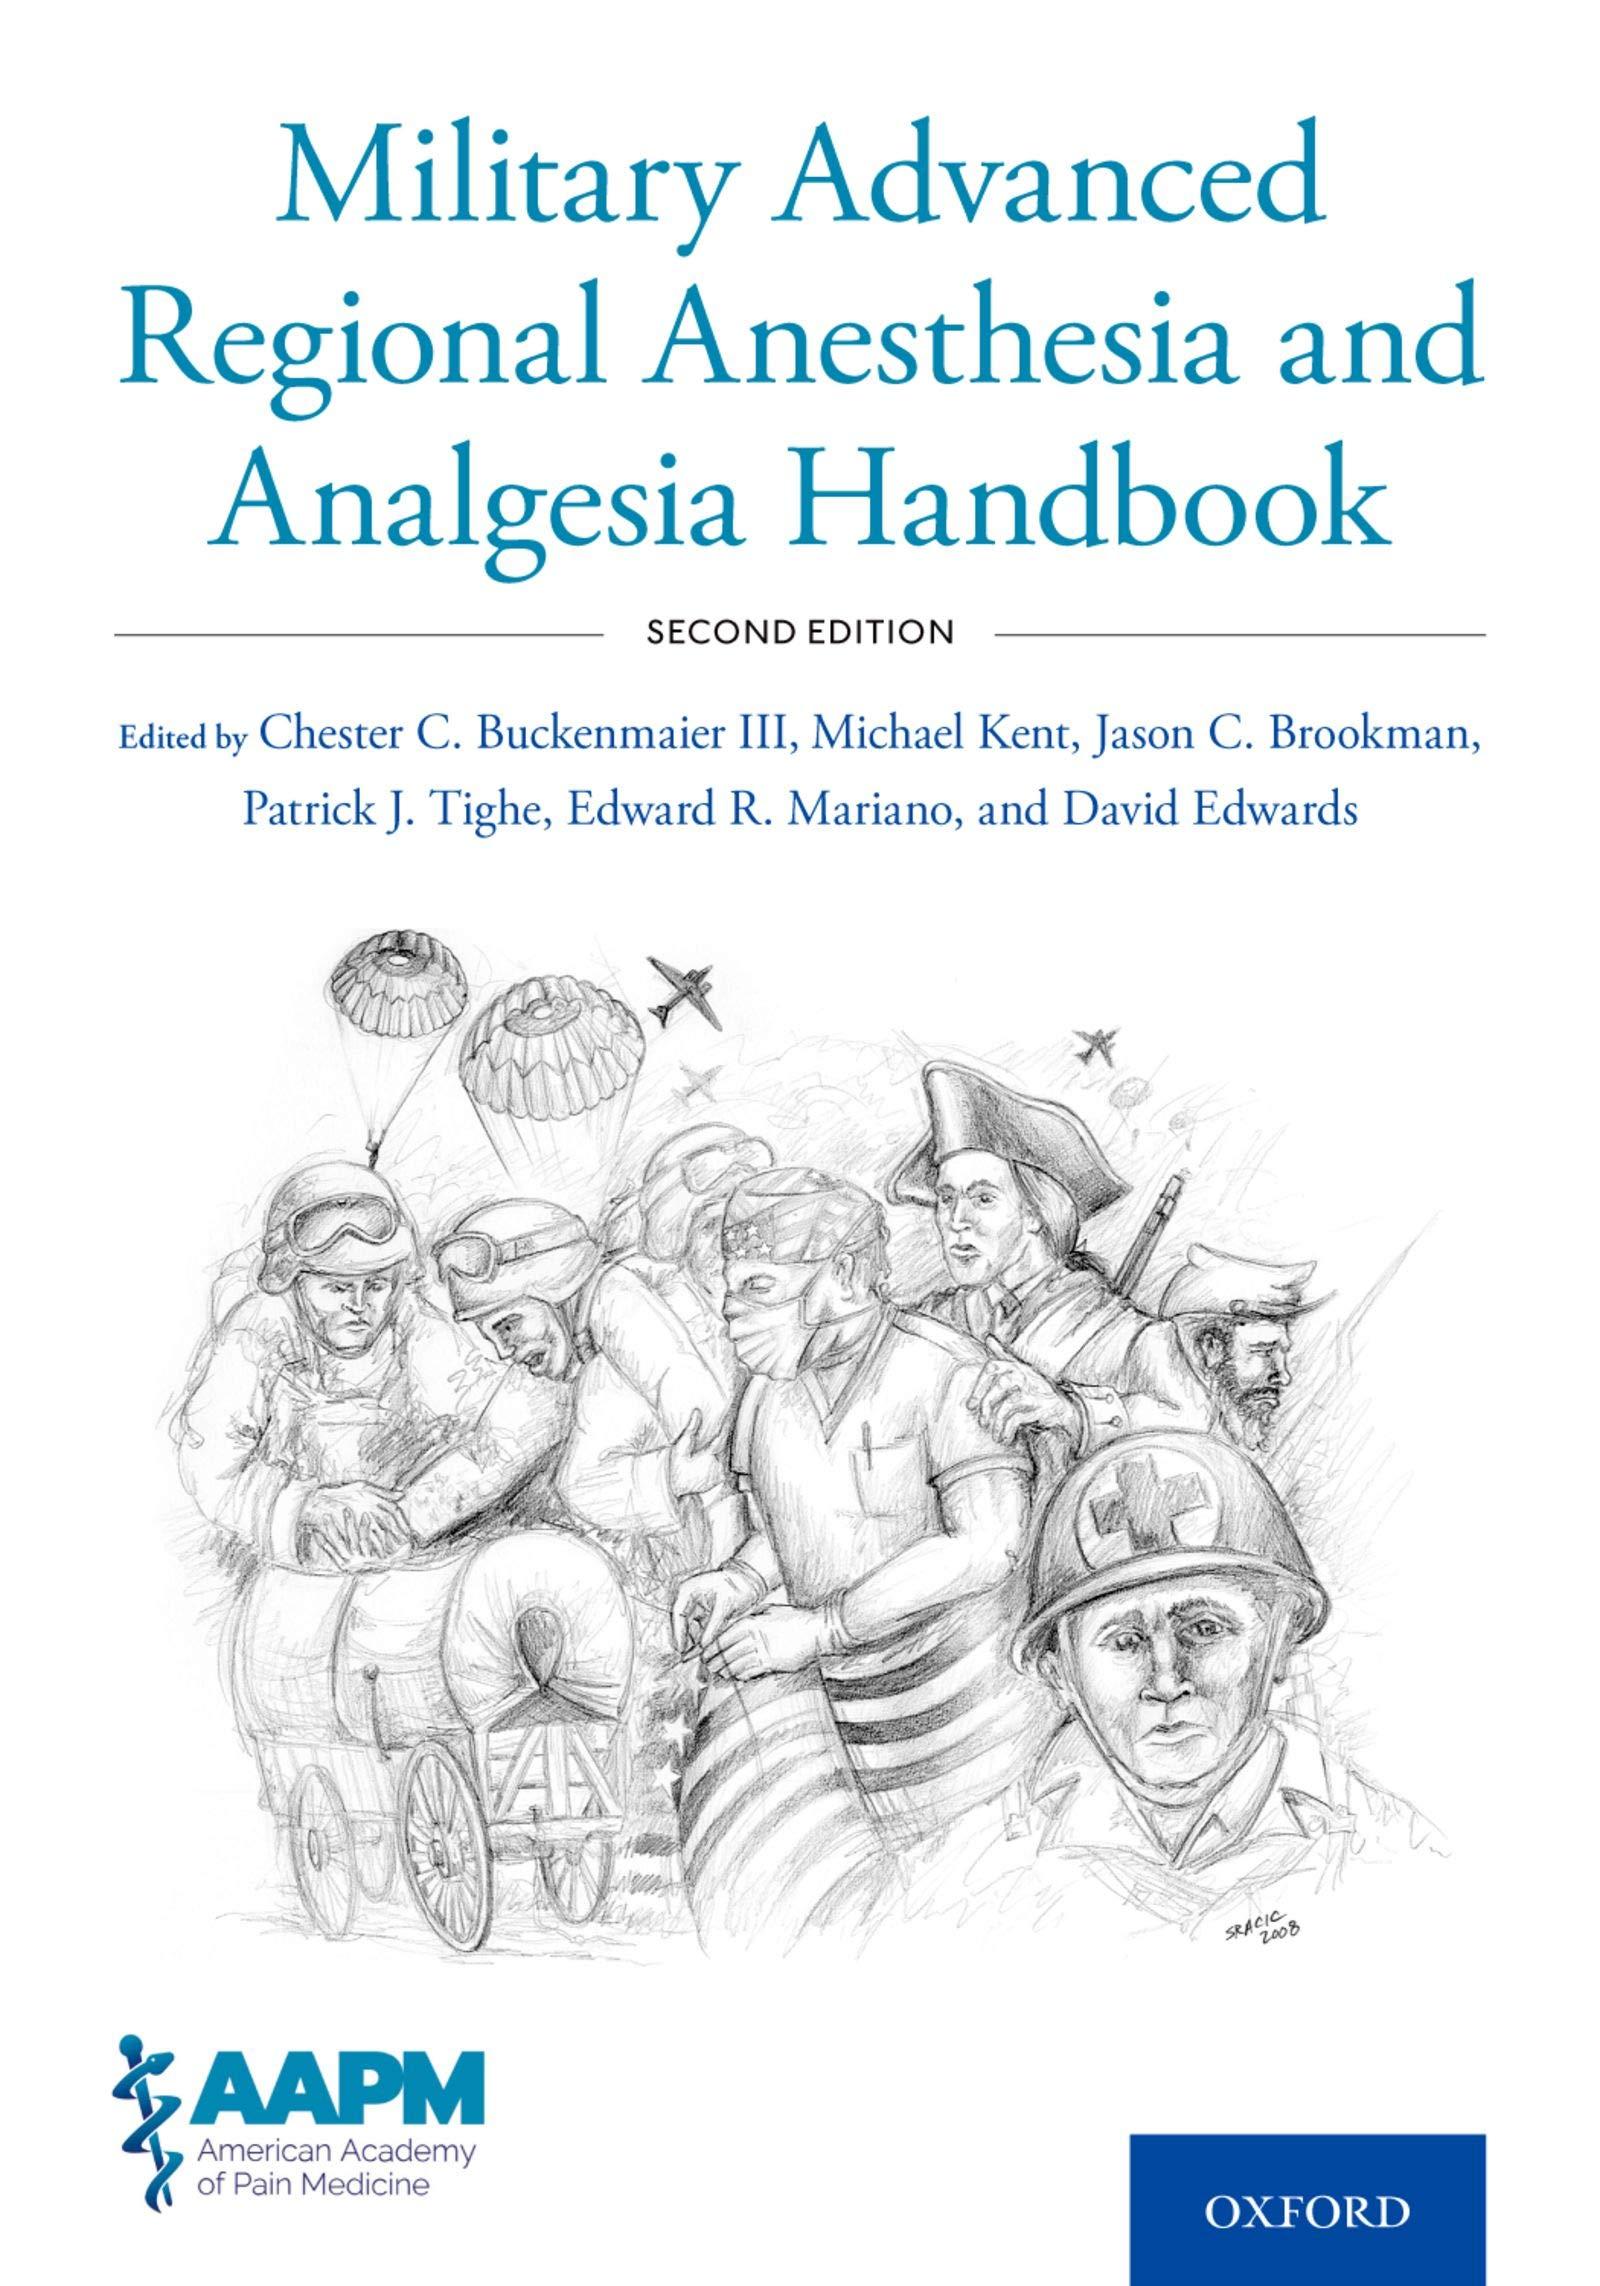 Military Advanced Regional Anesthesia and Analgesia Handbook